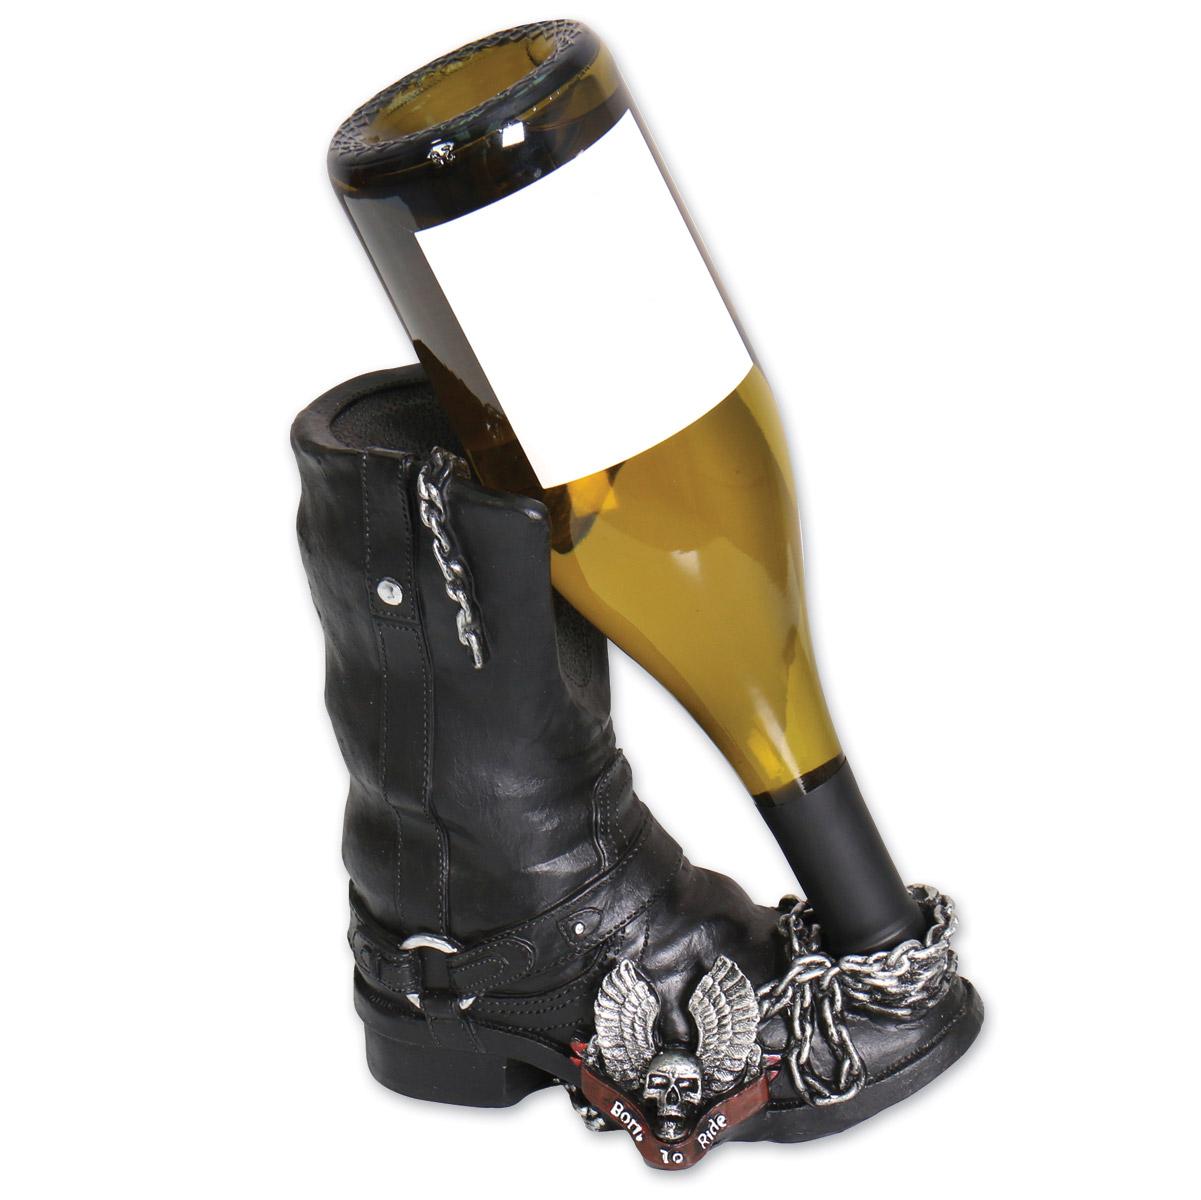 Hot Leathers Black Boot Wine Bottle Holder